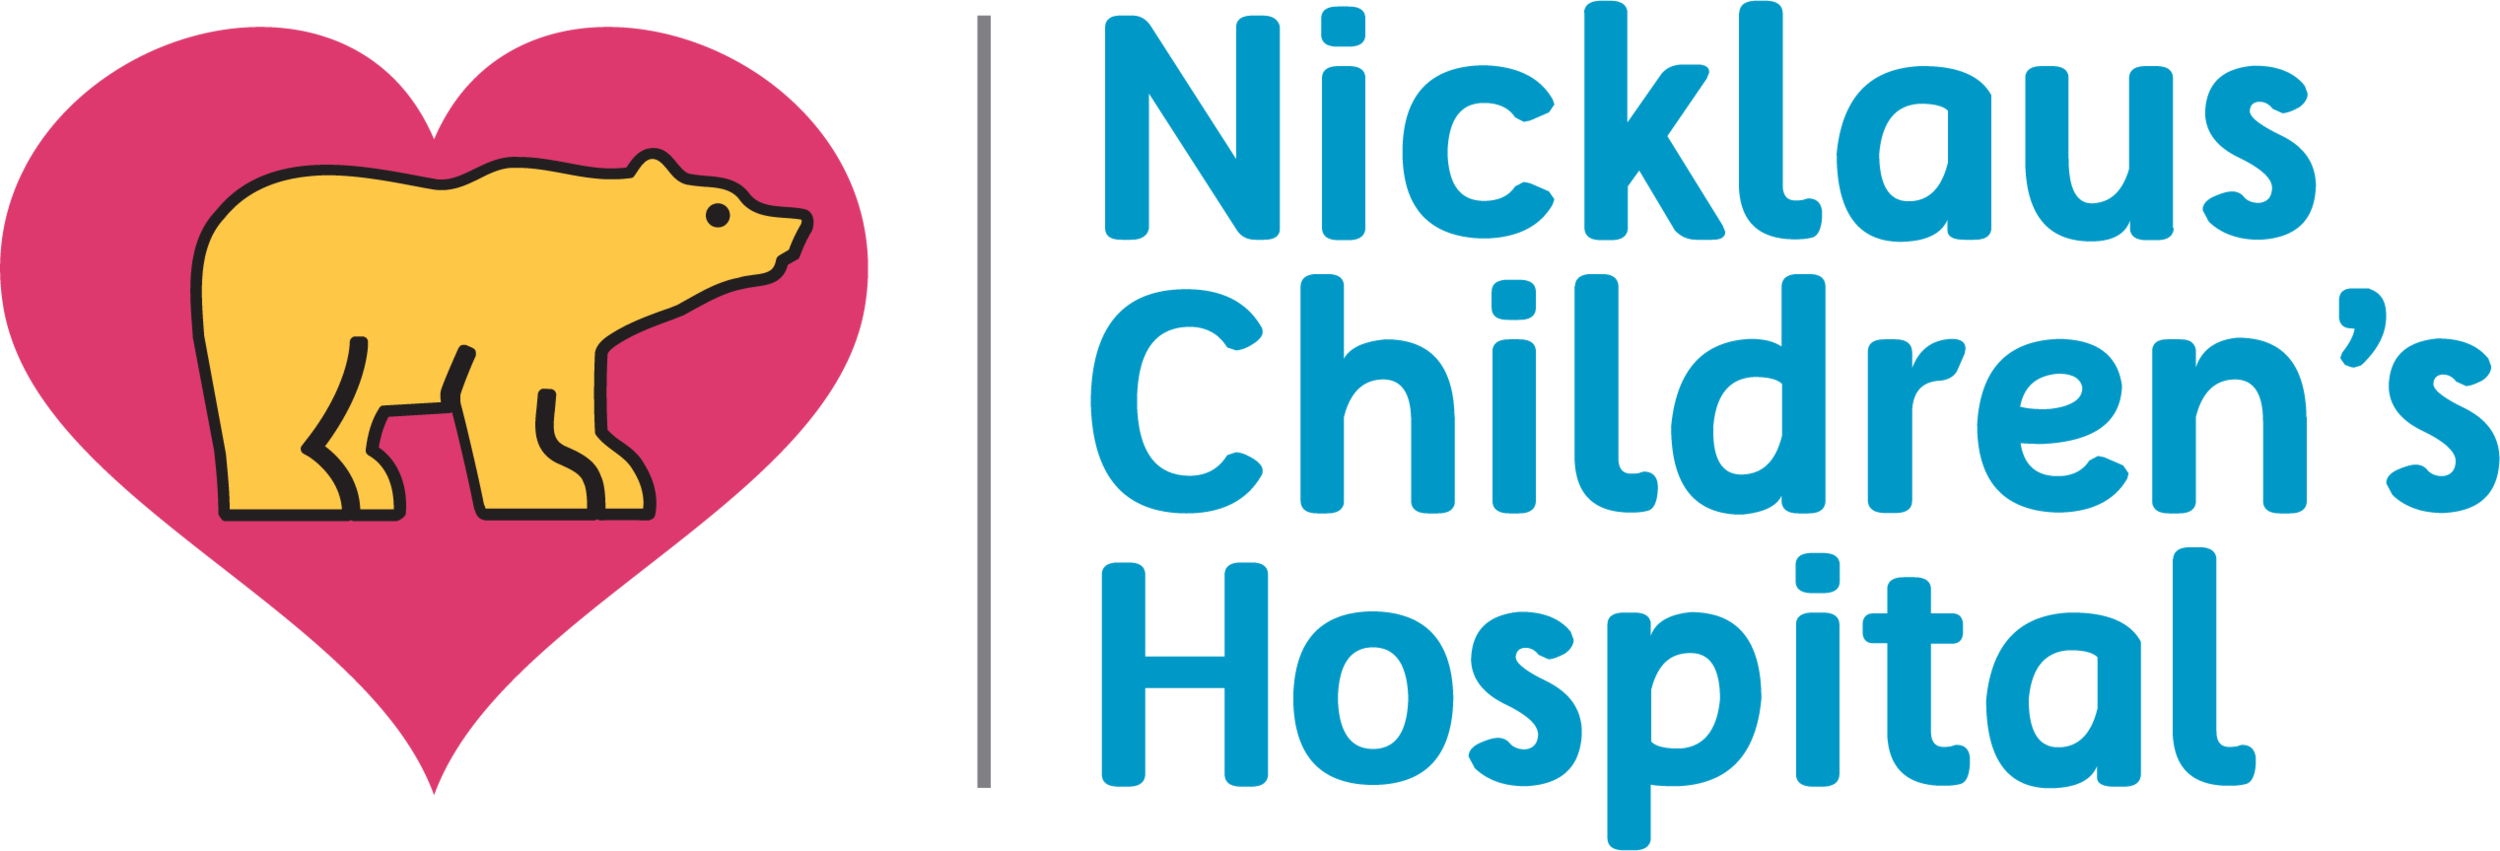 nicklauschildrens_Nicklaus-Childrens-HOSPITAL-LOGO.png